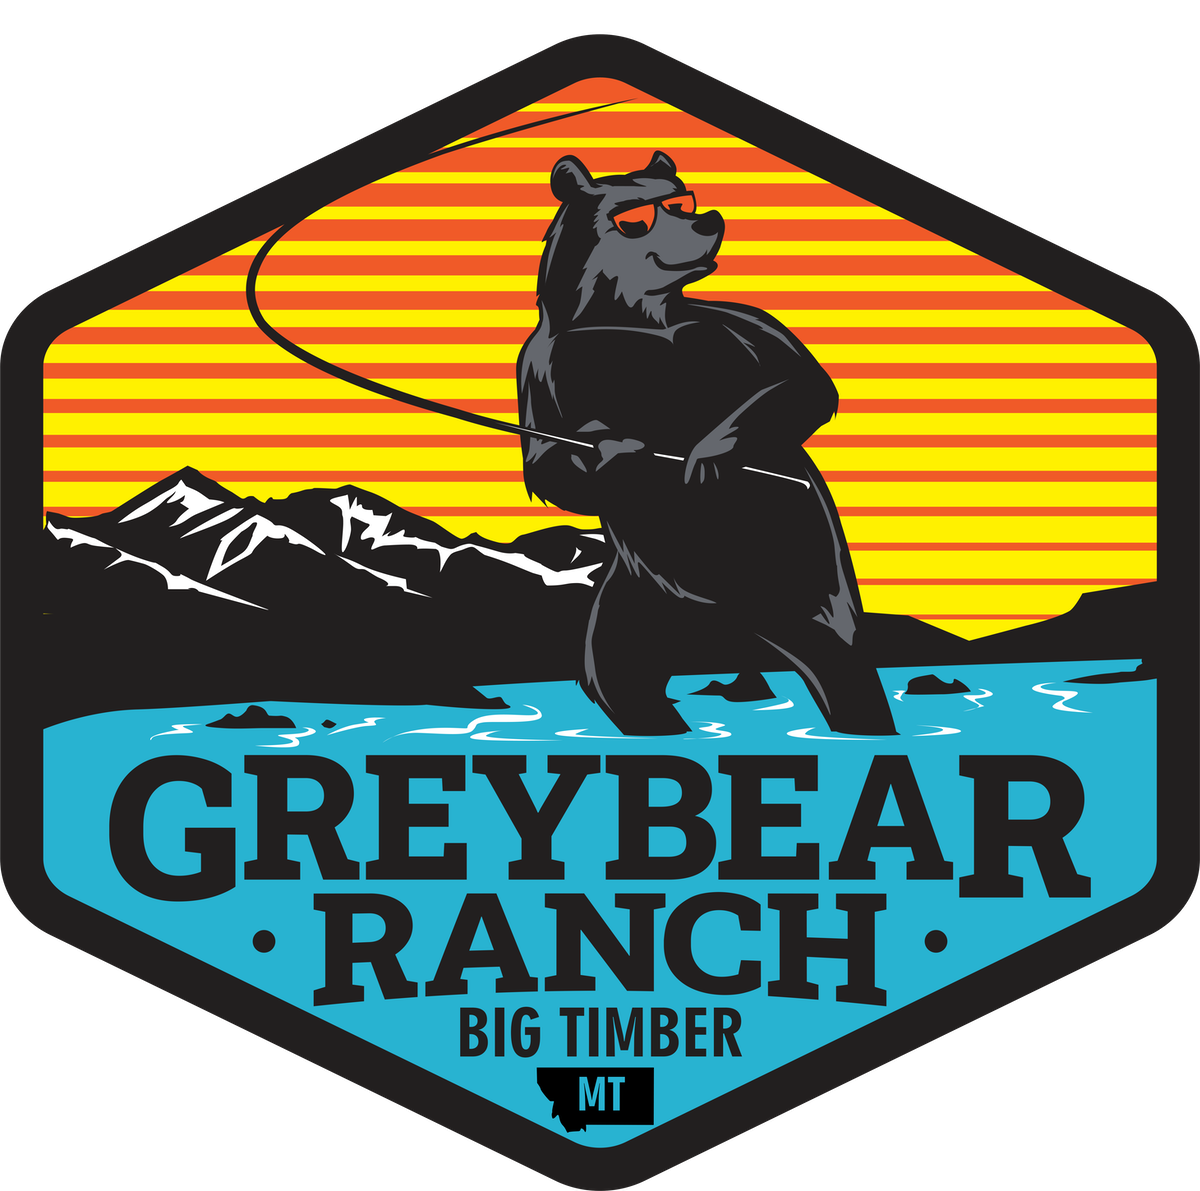 GreyBear Ranch changes